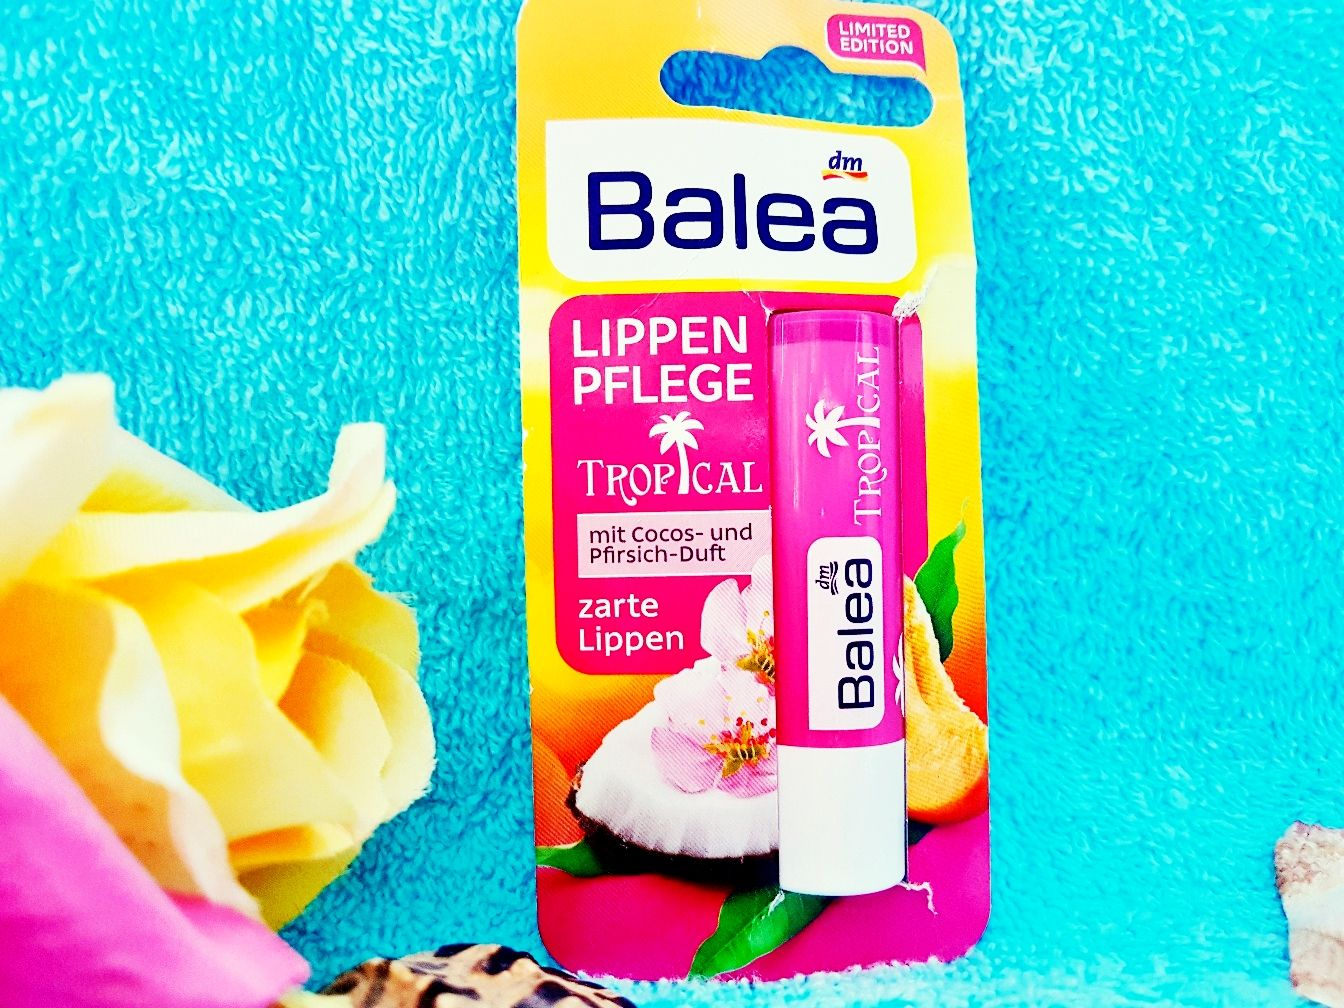 Balea Lippenpflege Tropical Lippen Pflege Lippenpflege Und Lippen